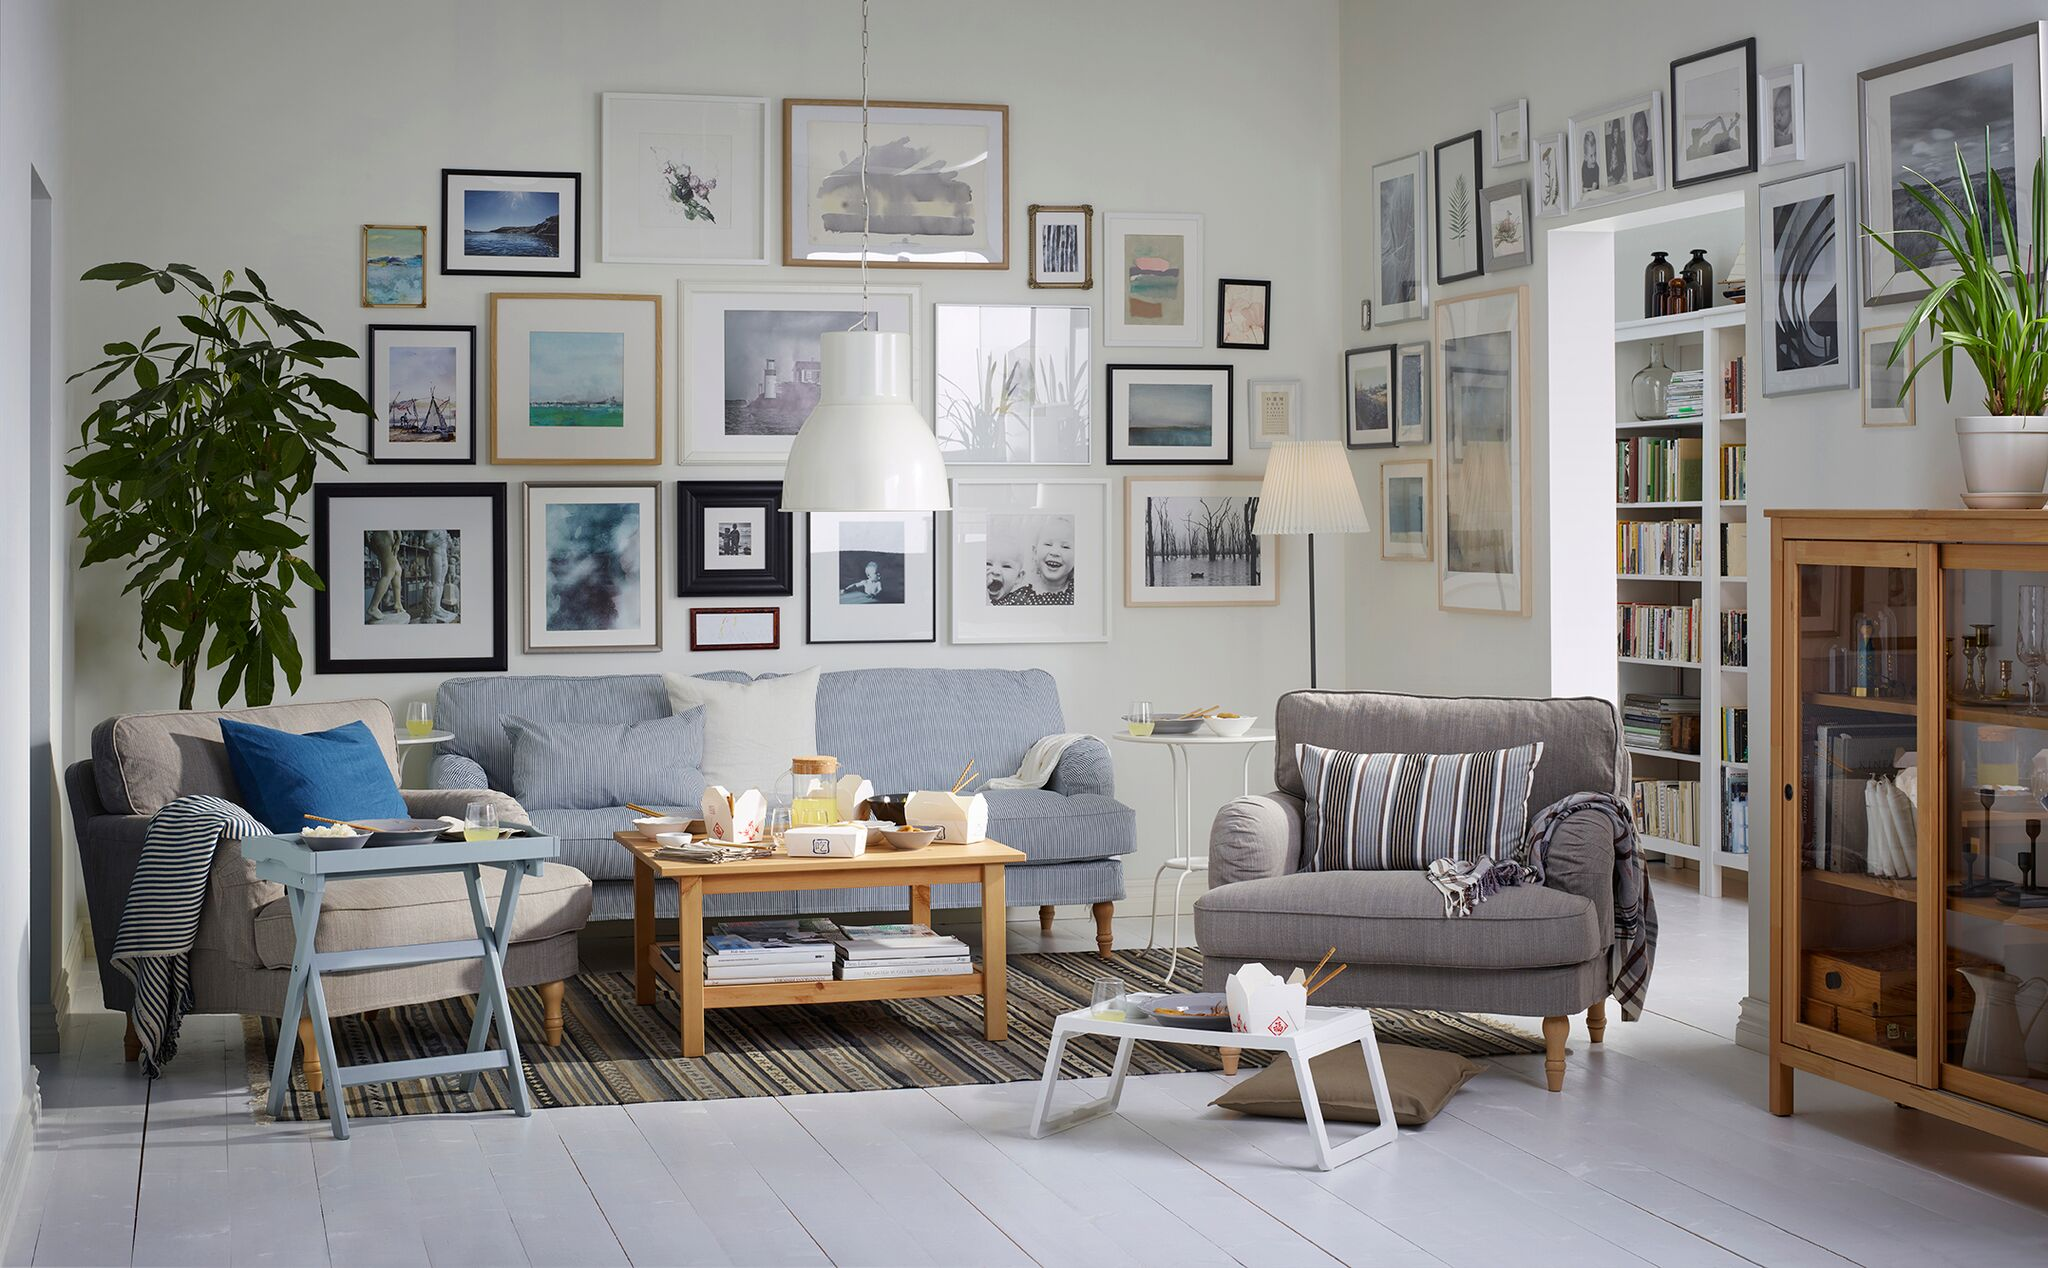 Avance novedades cat logo ikea 2018 virlova style - Decoracion muebles ikea ...